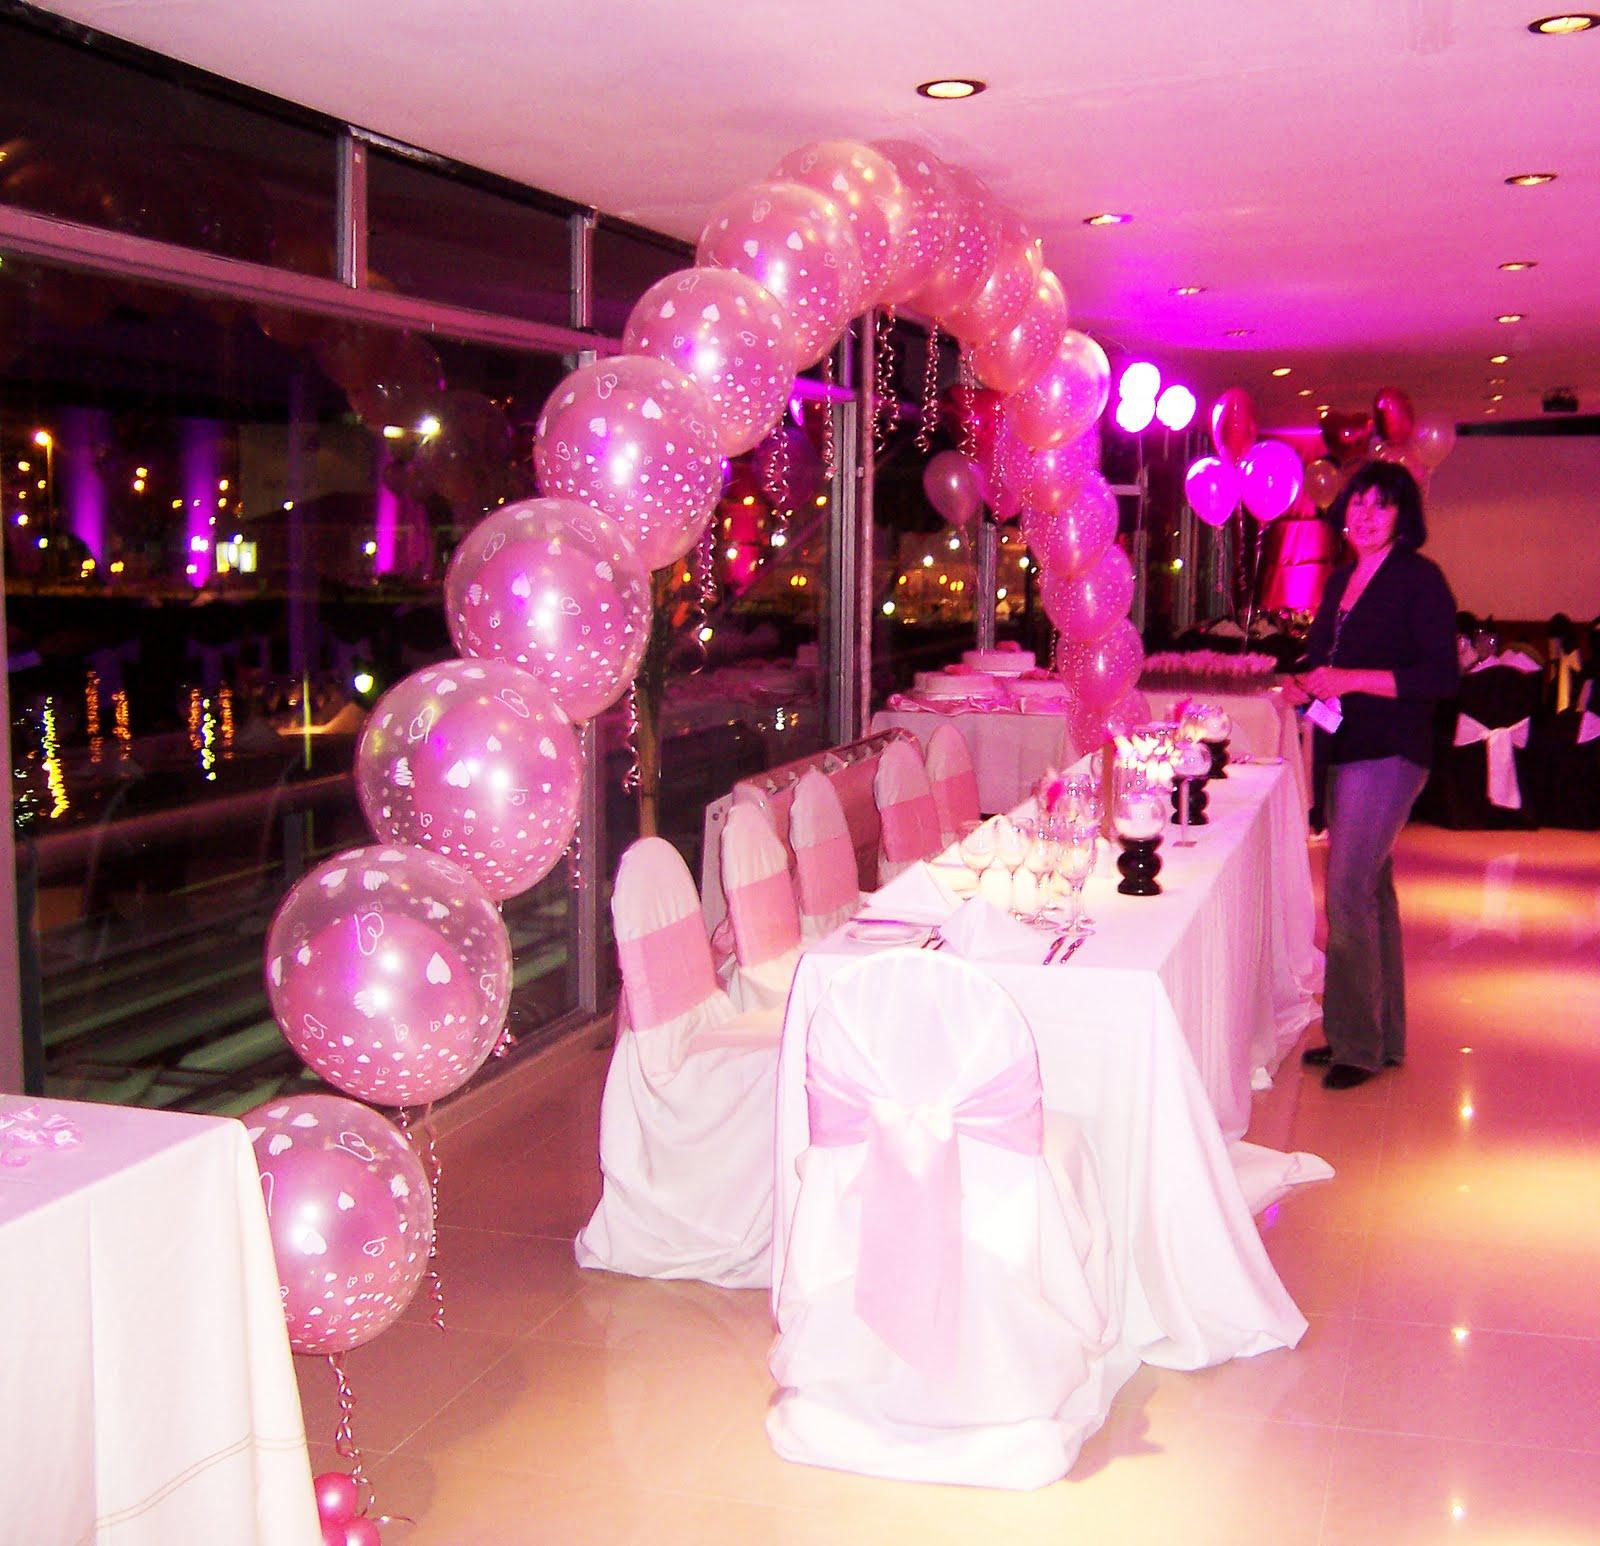 Selva luz decoraci n con globos buenos aires argentina for Decoracion de pared para quinceanera